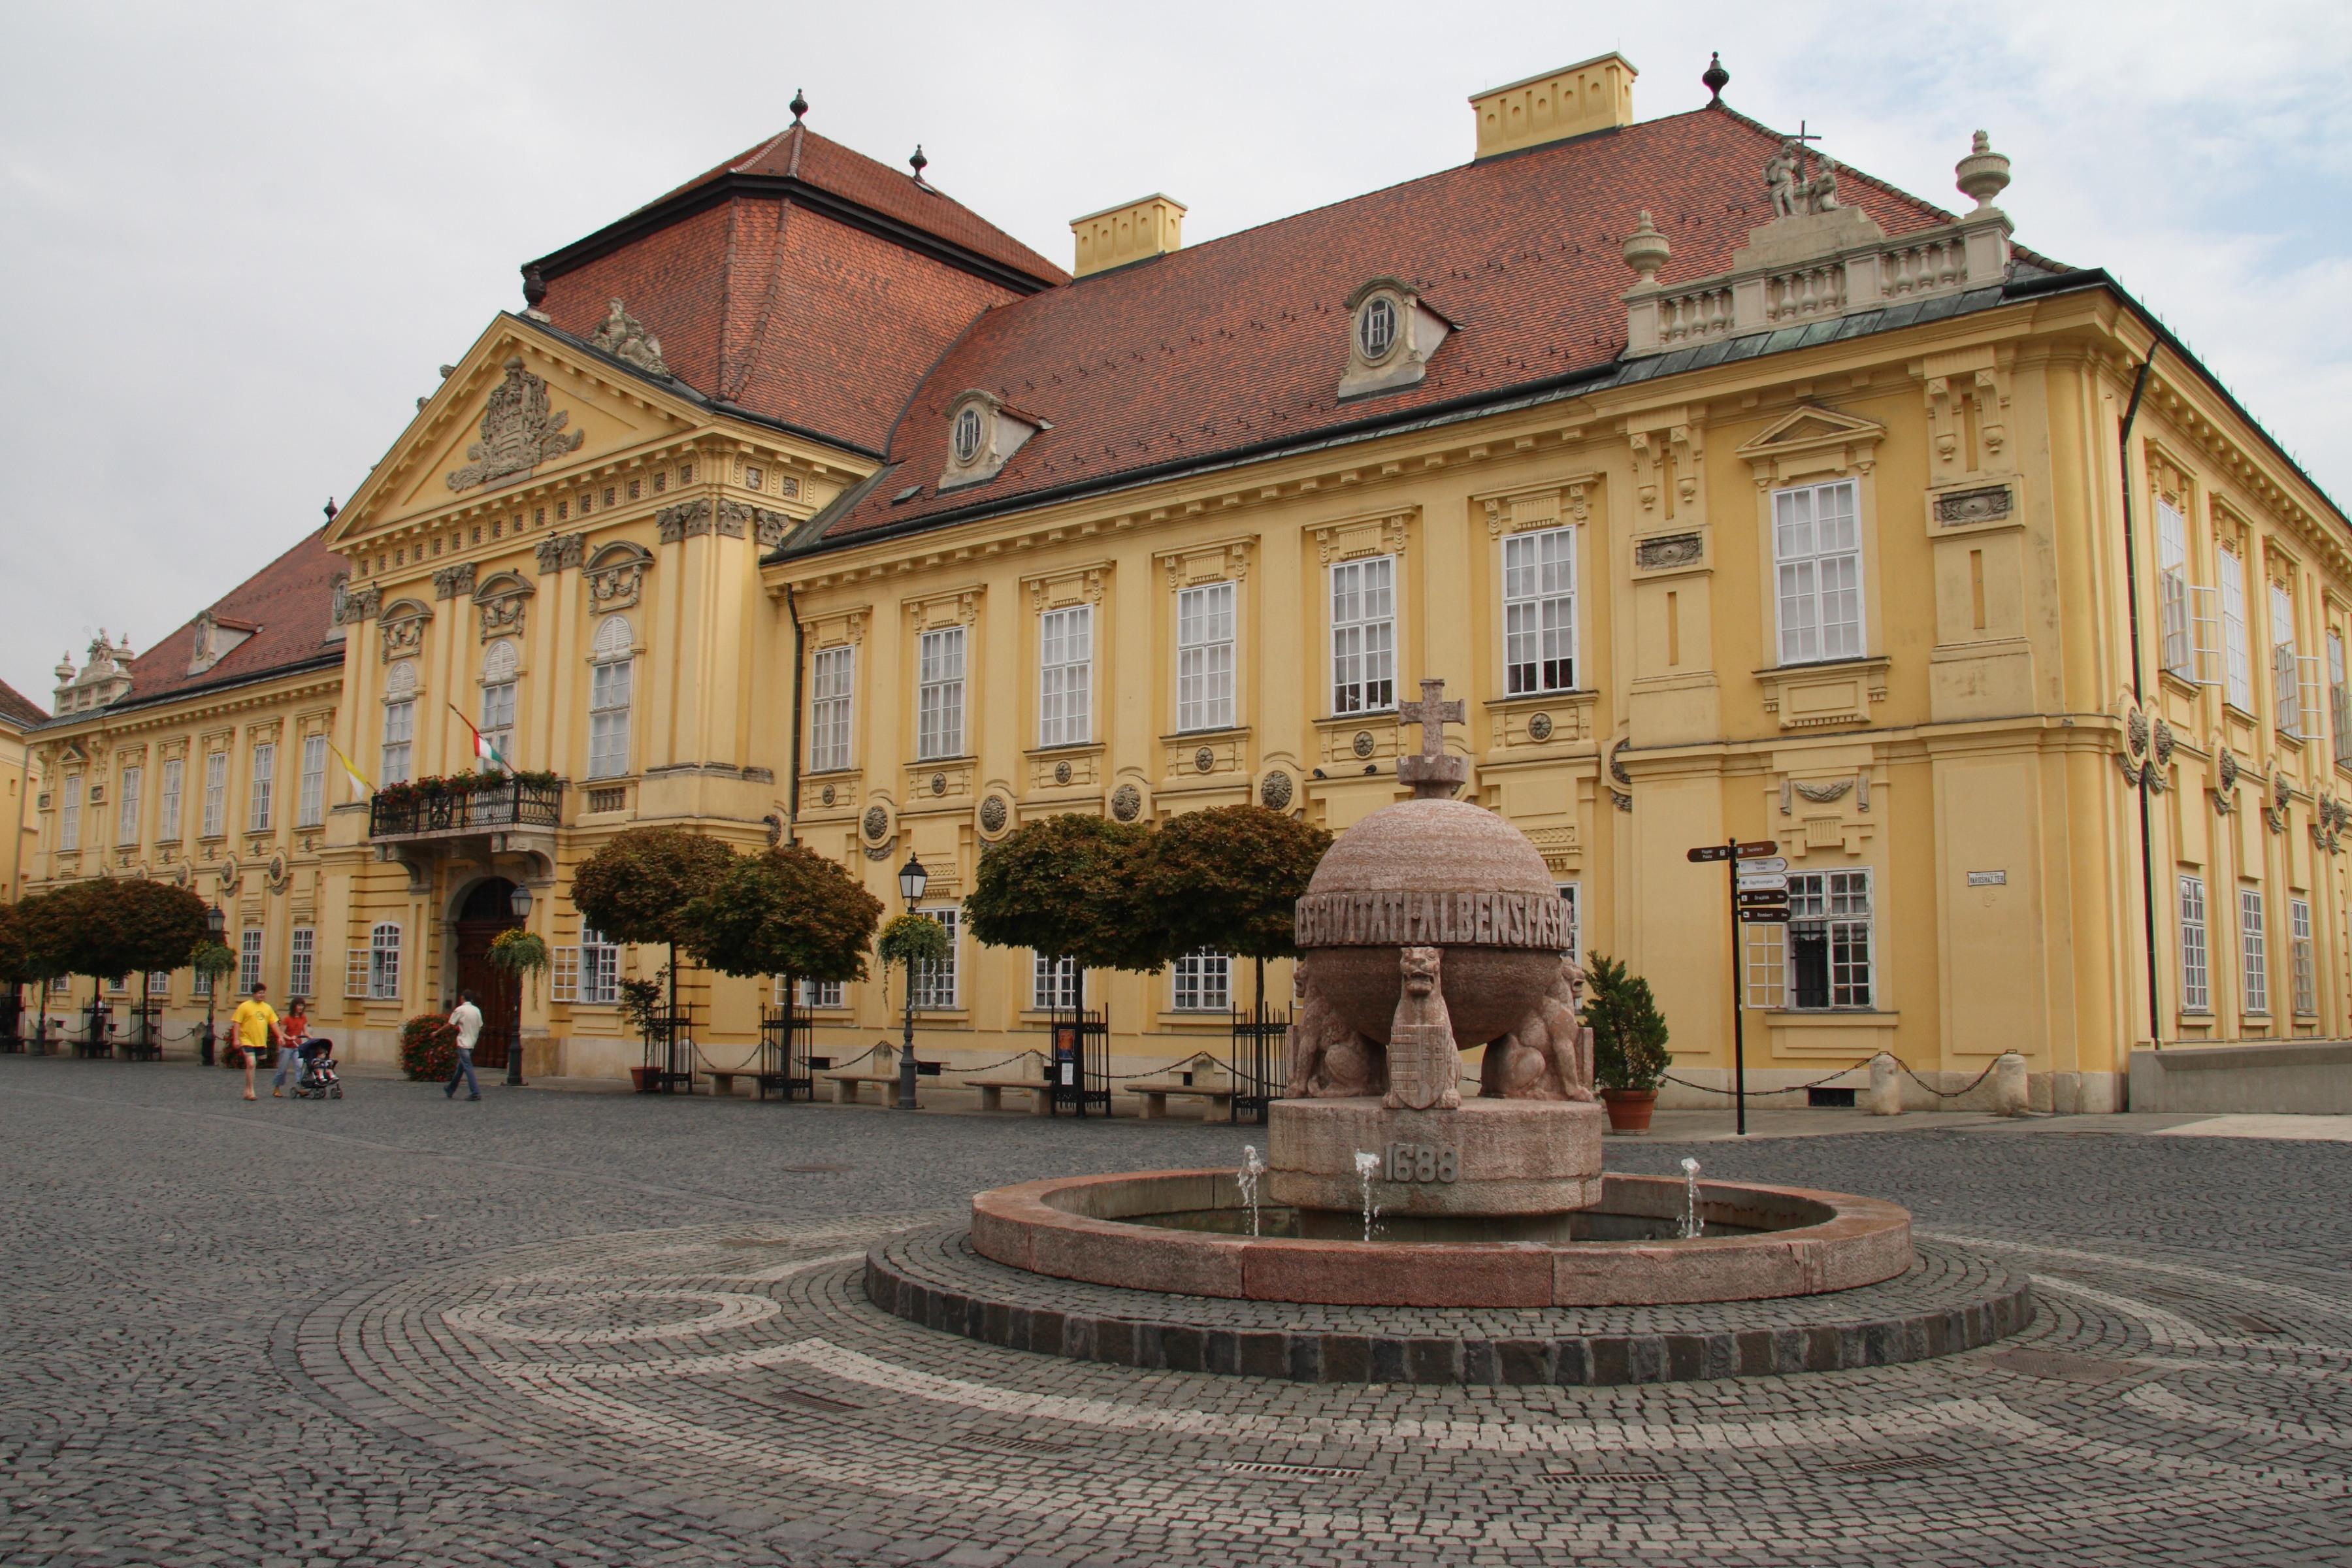 Szekesfehervar Hungary  City pictures : Szekesfehervar Orb and Episcopal Palace Wikipedia, the free ...